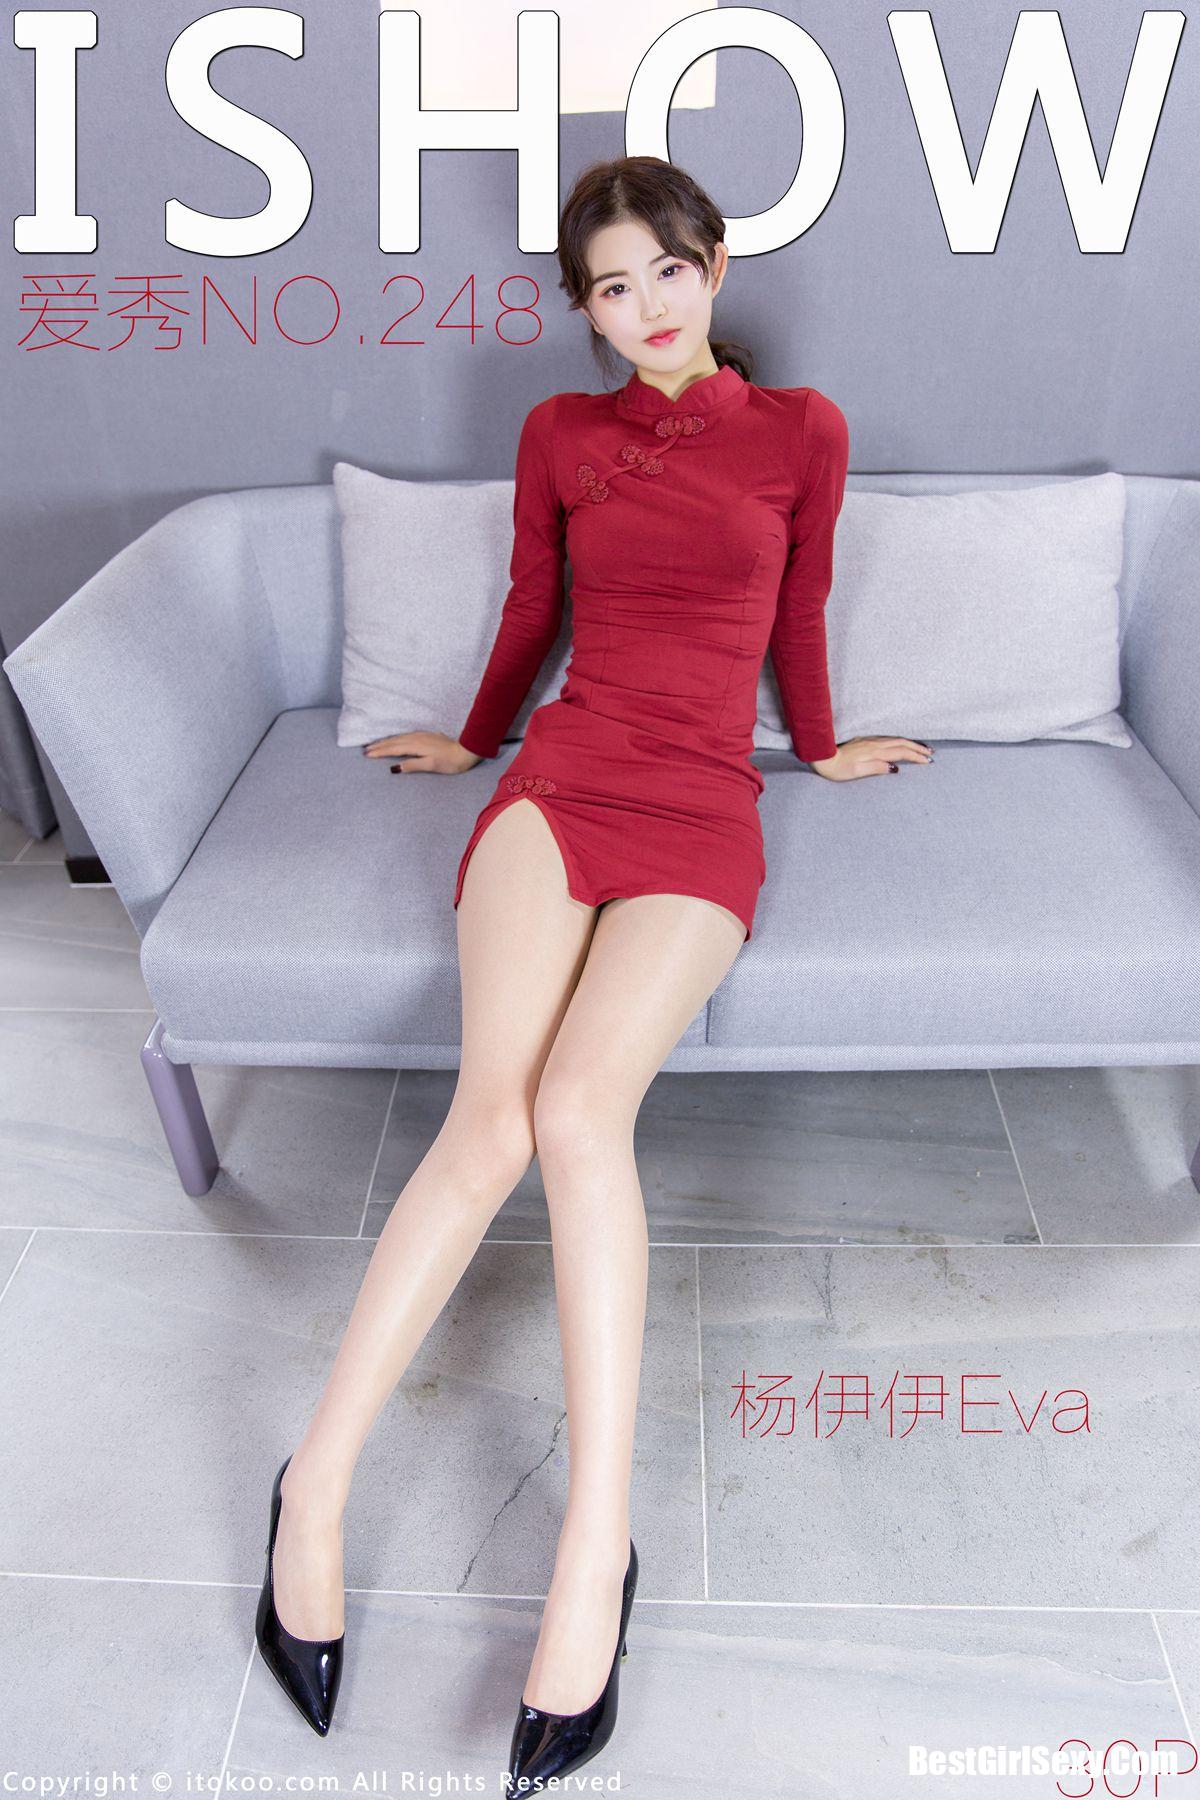 Ishow爱秀 No.248 杨伊伊Eva